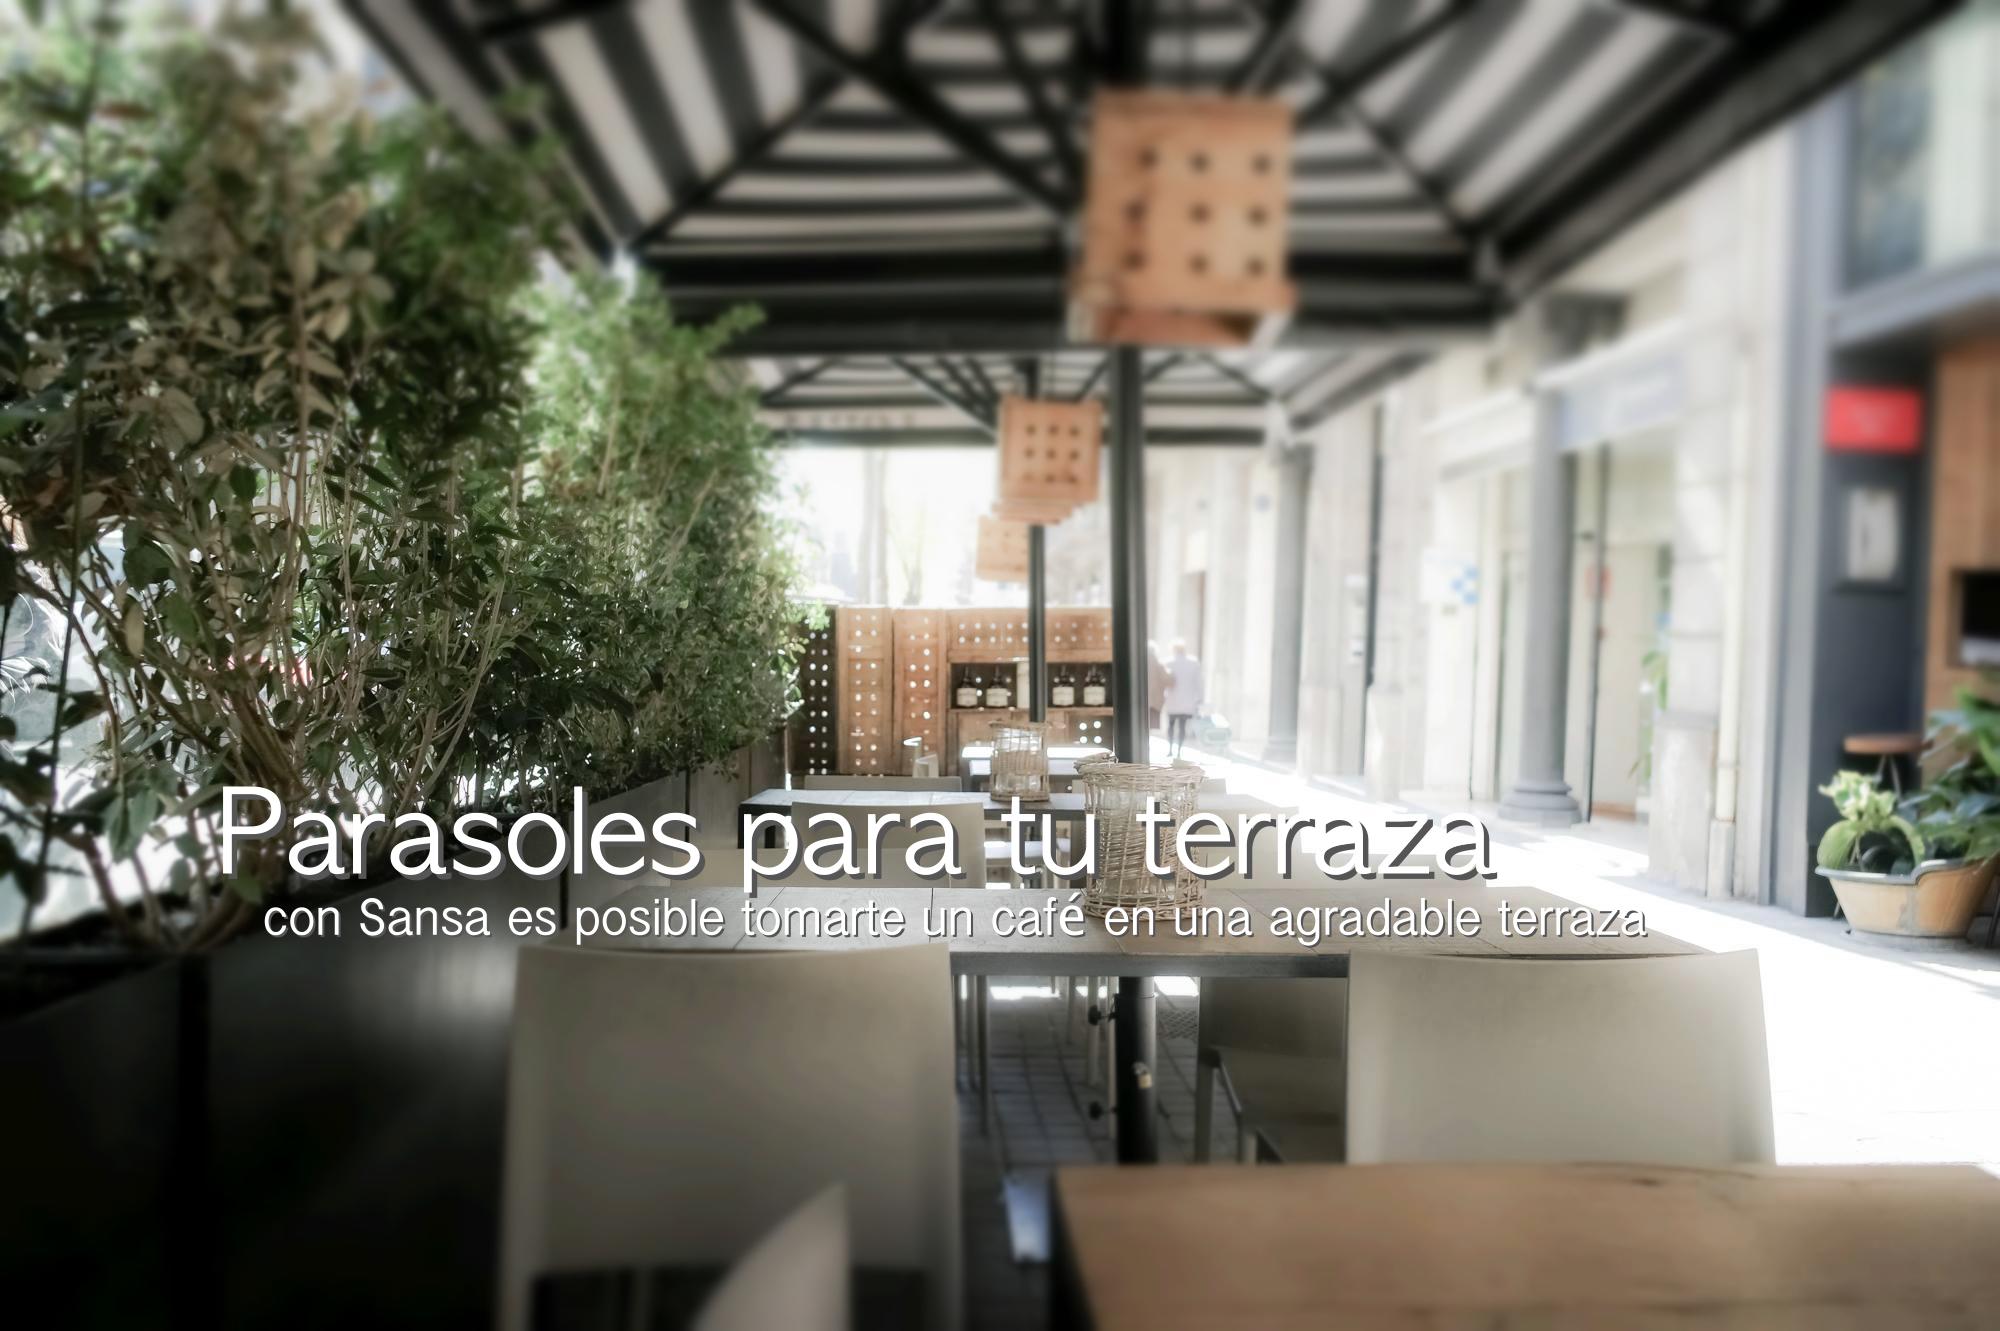 SANSA PARASOLS PARA TU TERRAZA